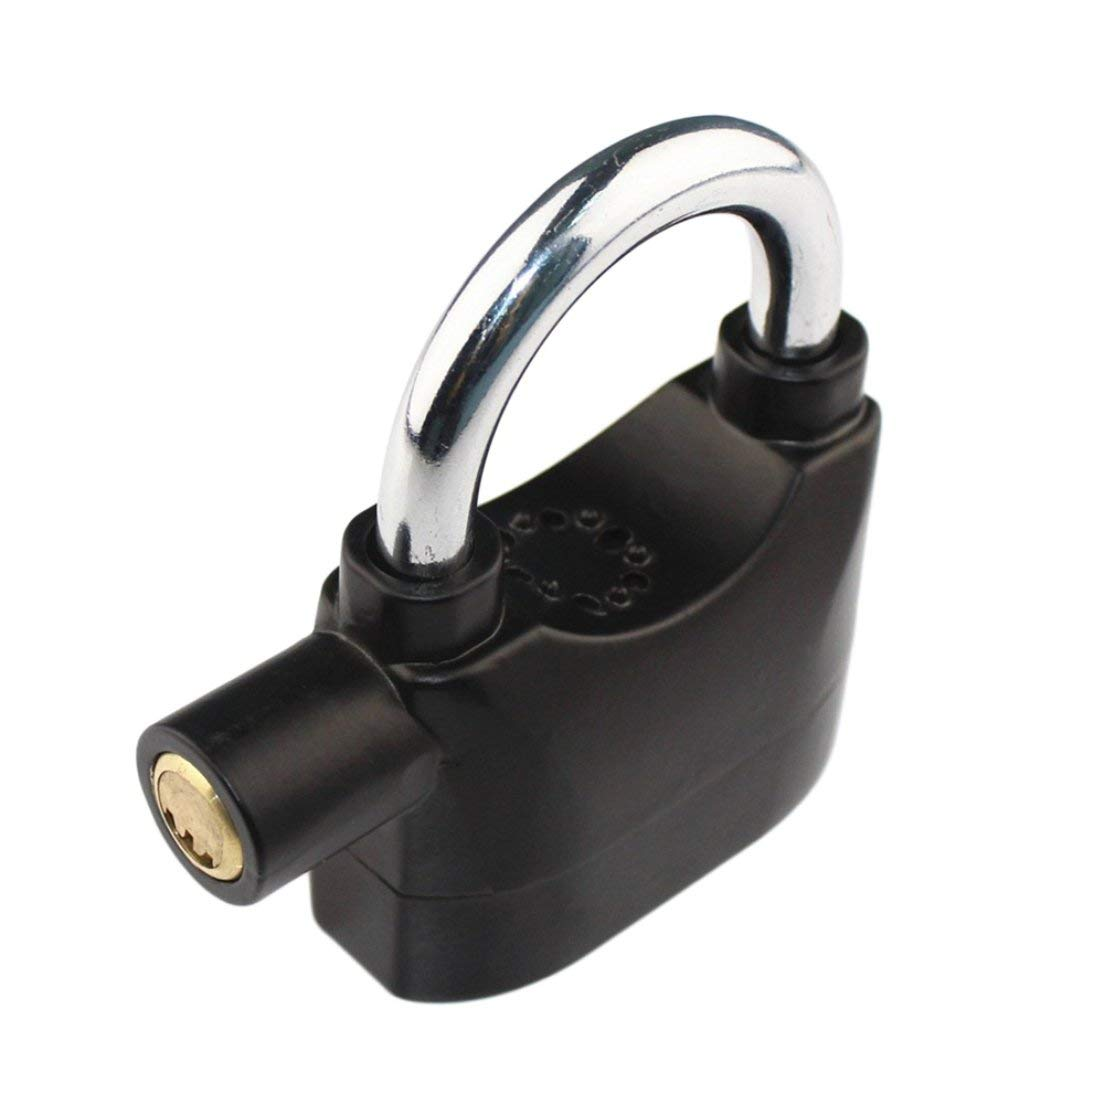 Color:Black Kaemma Negro Sirena Impermeable Candado de Alarma Candado de Alarma para Motocicleta Bicicleta Bicicleta Seguridad candados de Alarma de 110dB